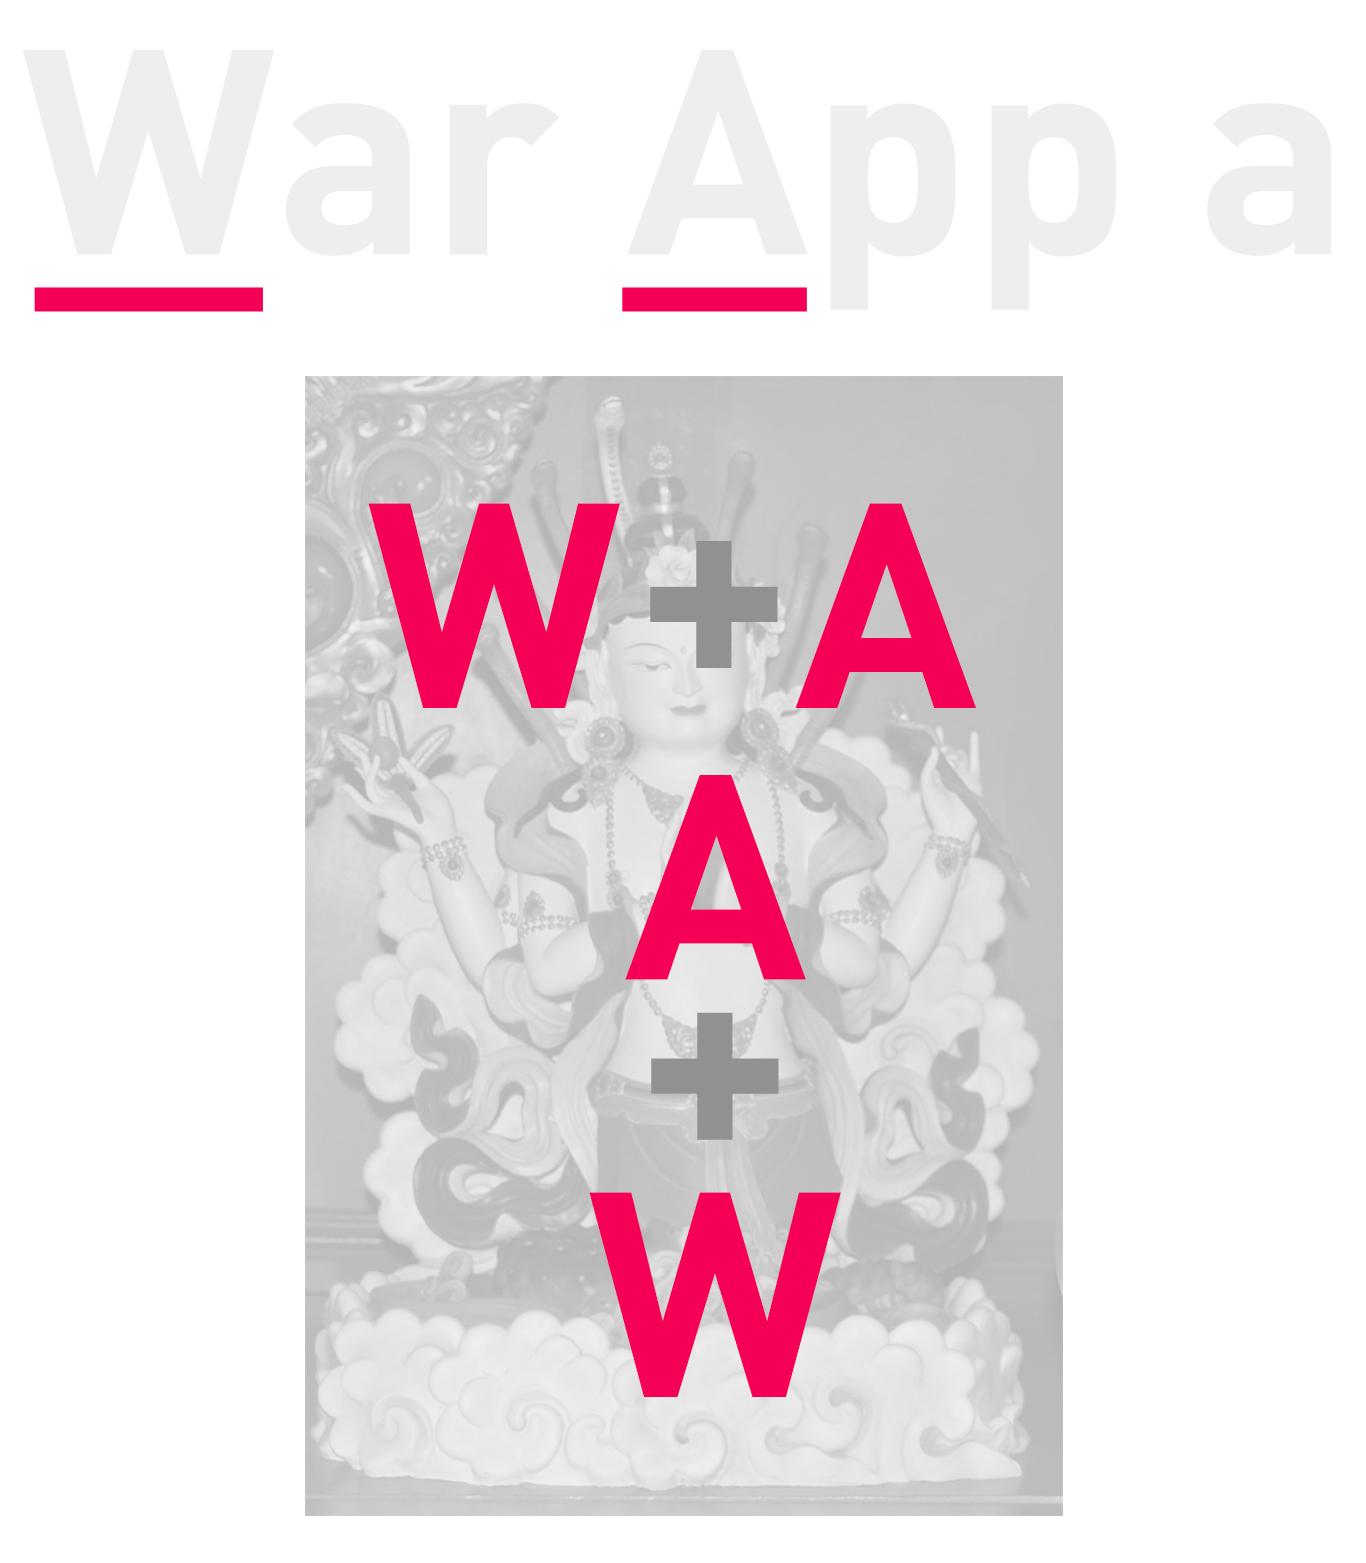 warappa-koncept